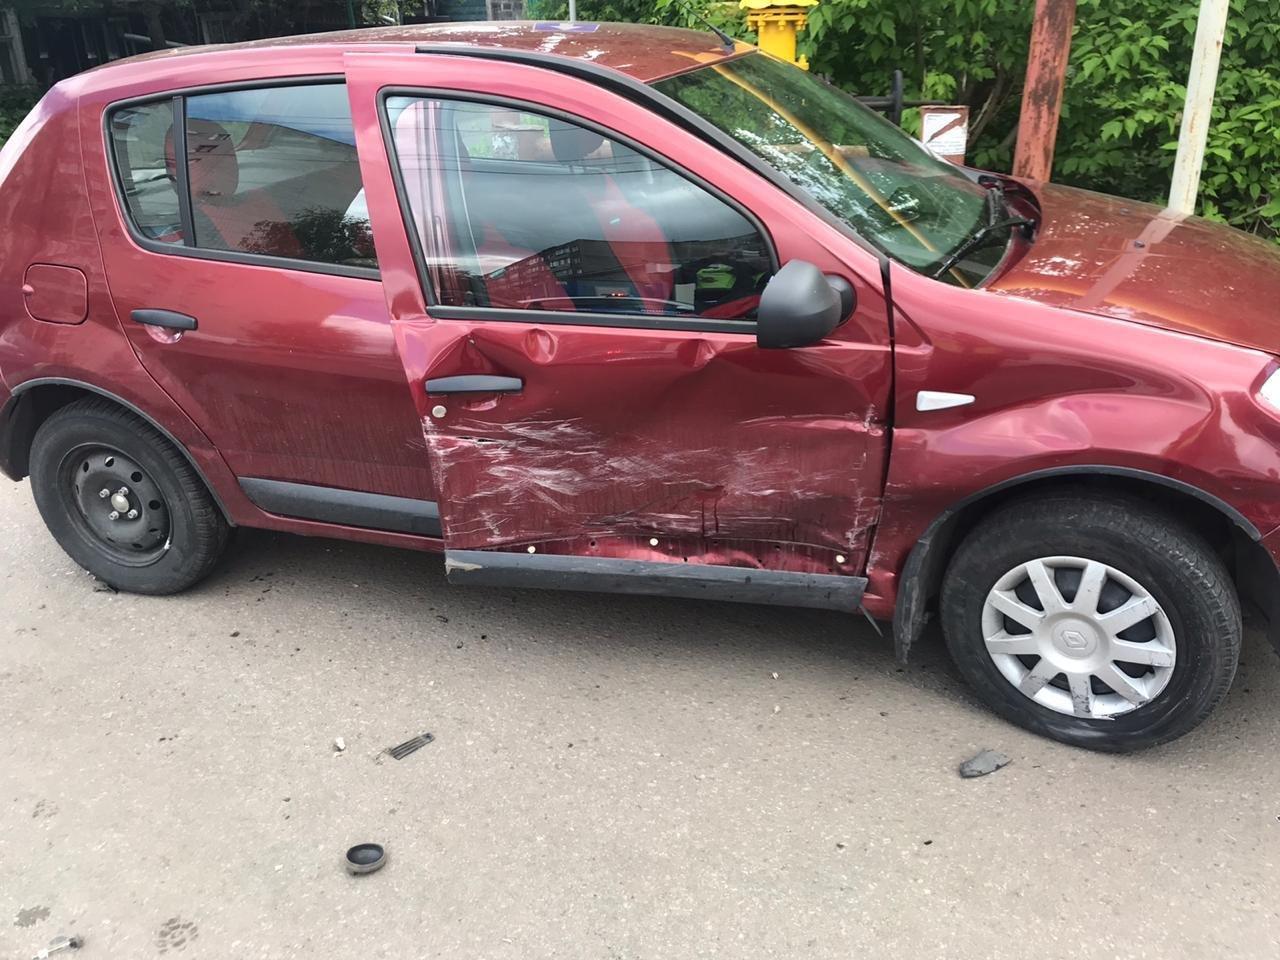 В Мичуринске две автоледи не поделили дорогу, а пострадал пешеход, фото-1